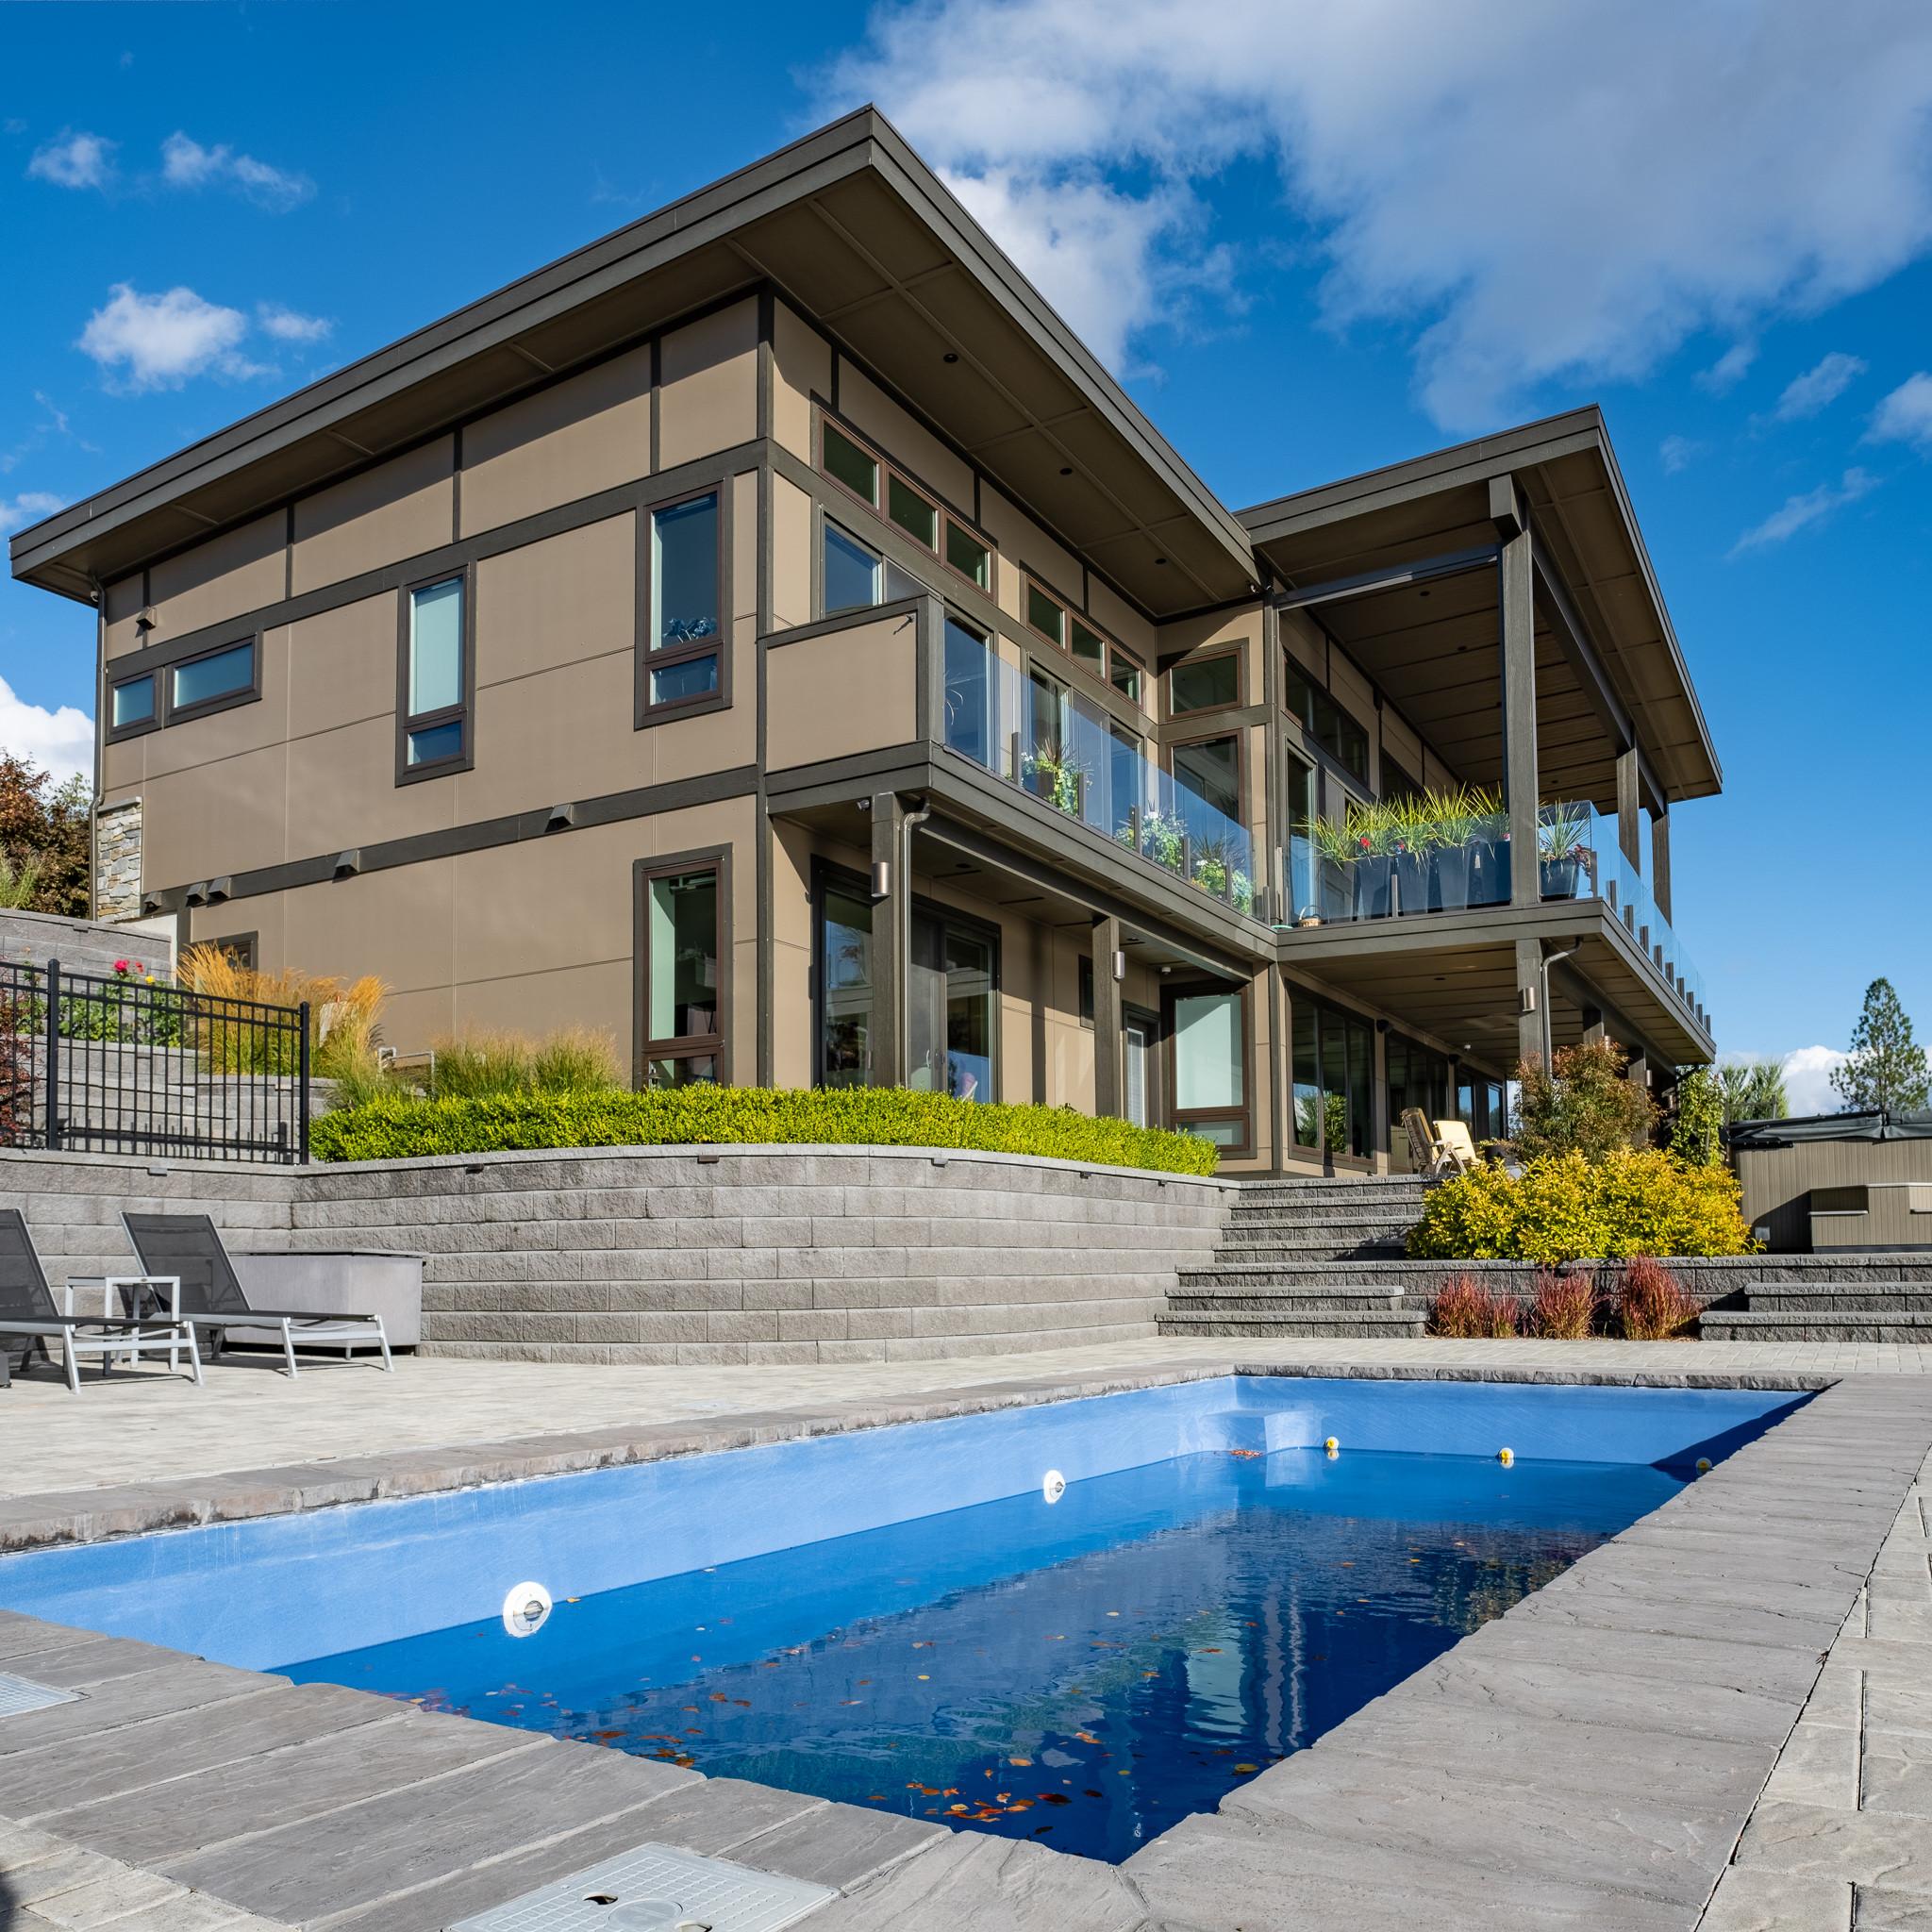 Hillside Okanagan Lake View Home